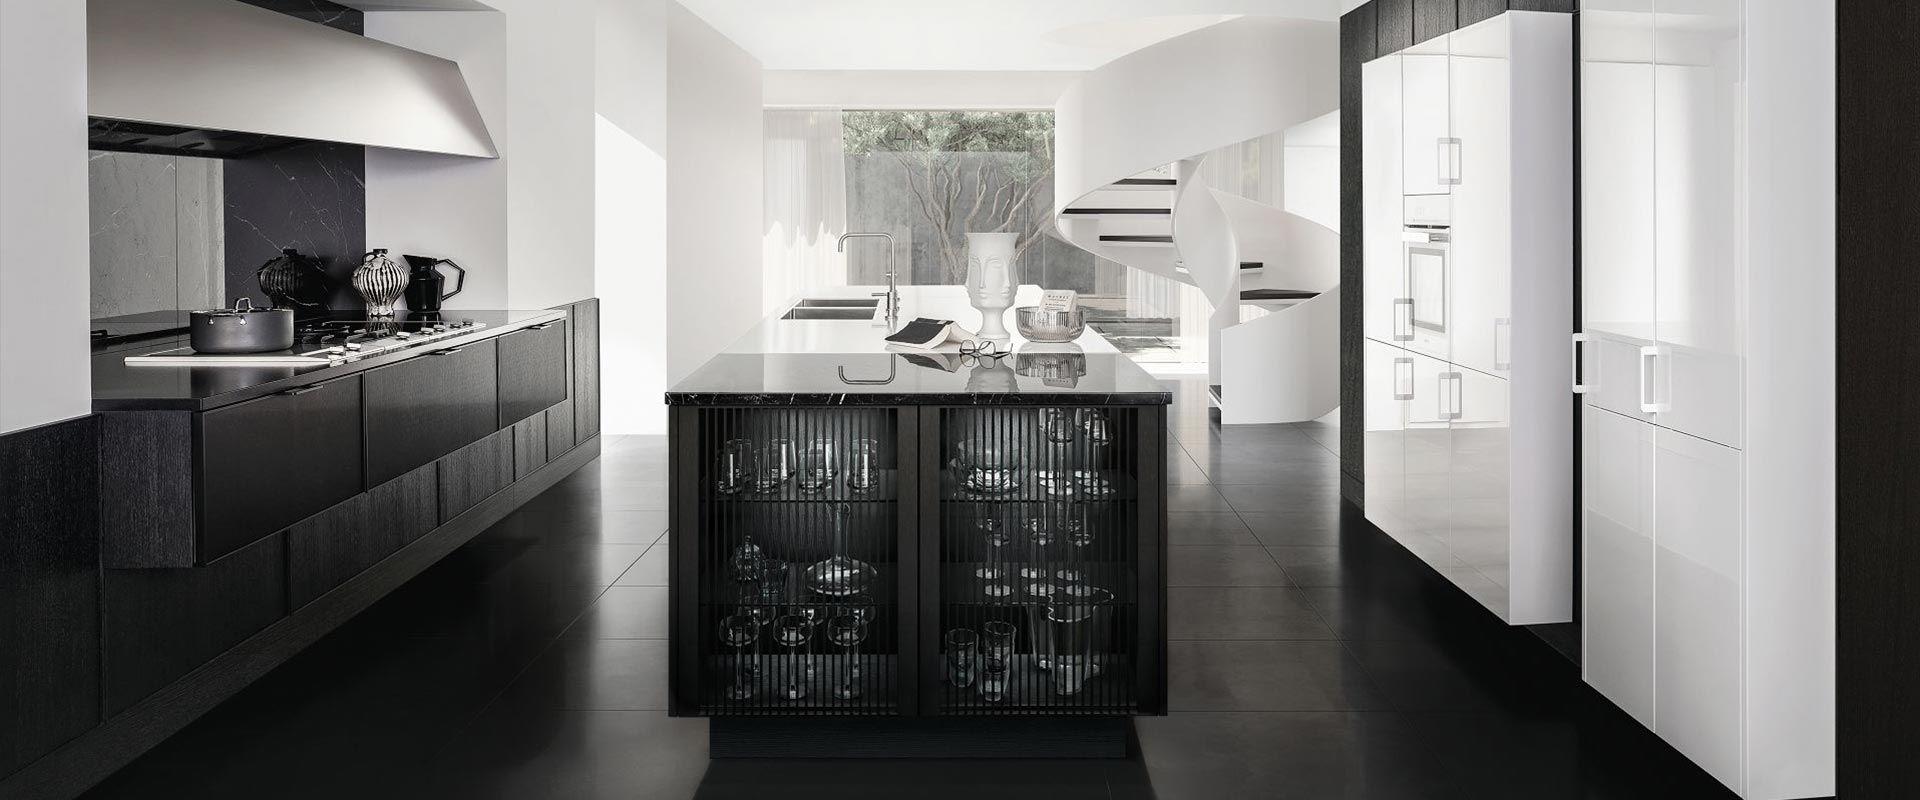 Zwevende keukenkasten